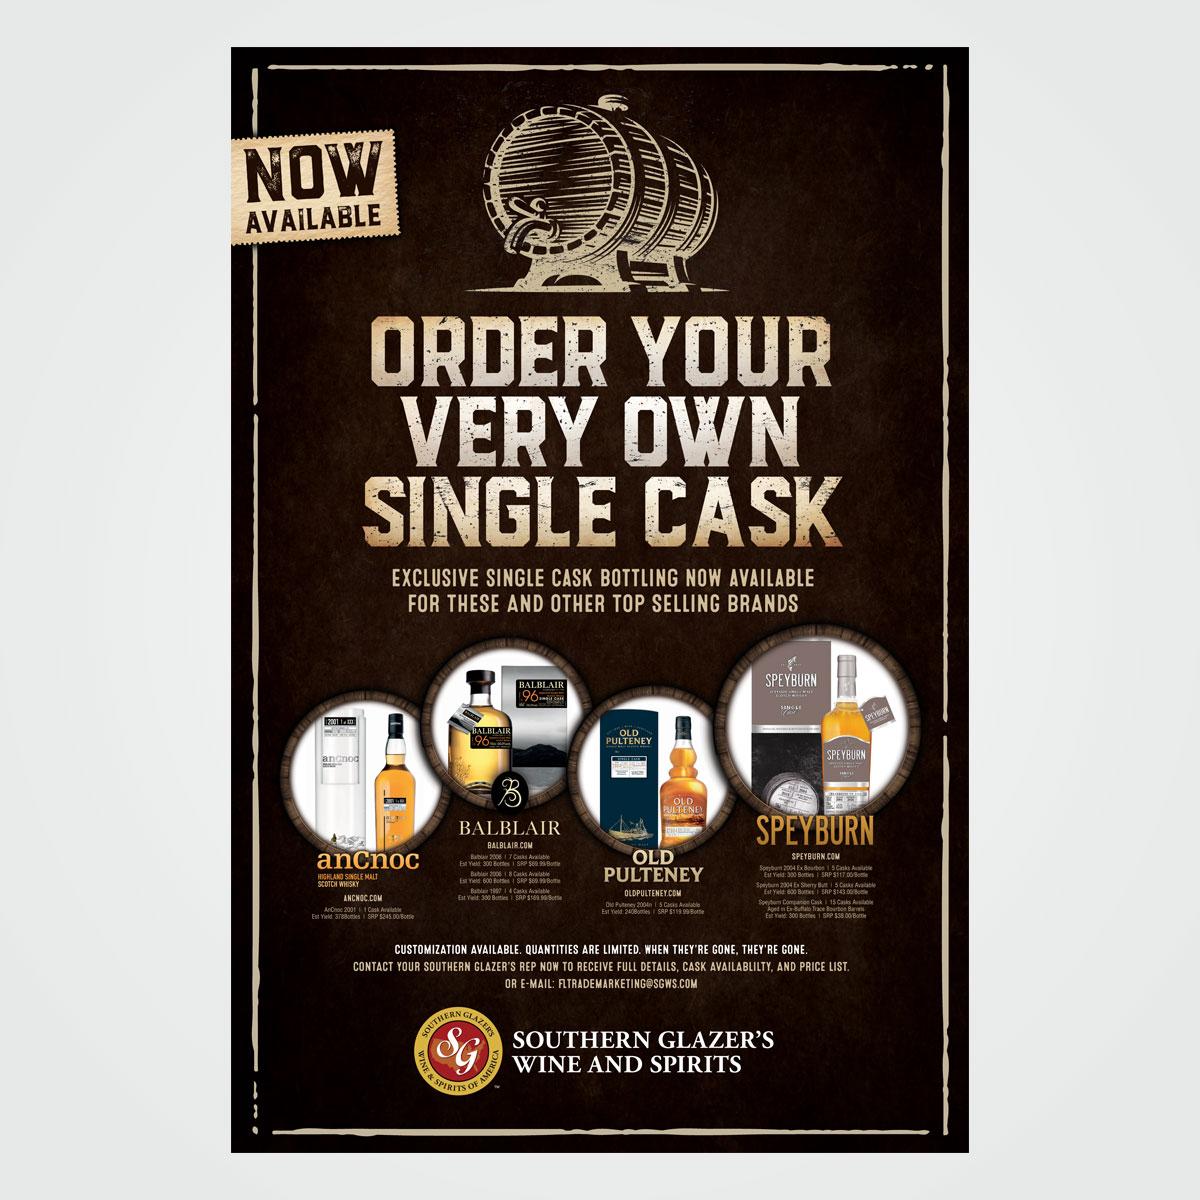 Poster design for Southern Glazer's Wine & Spirits promoting single cask program